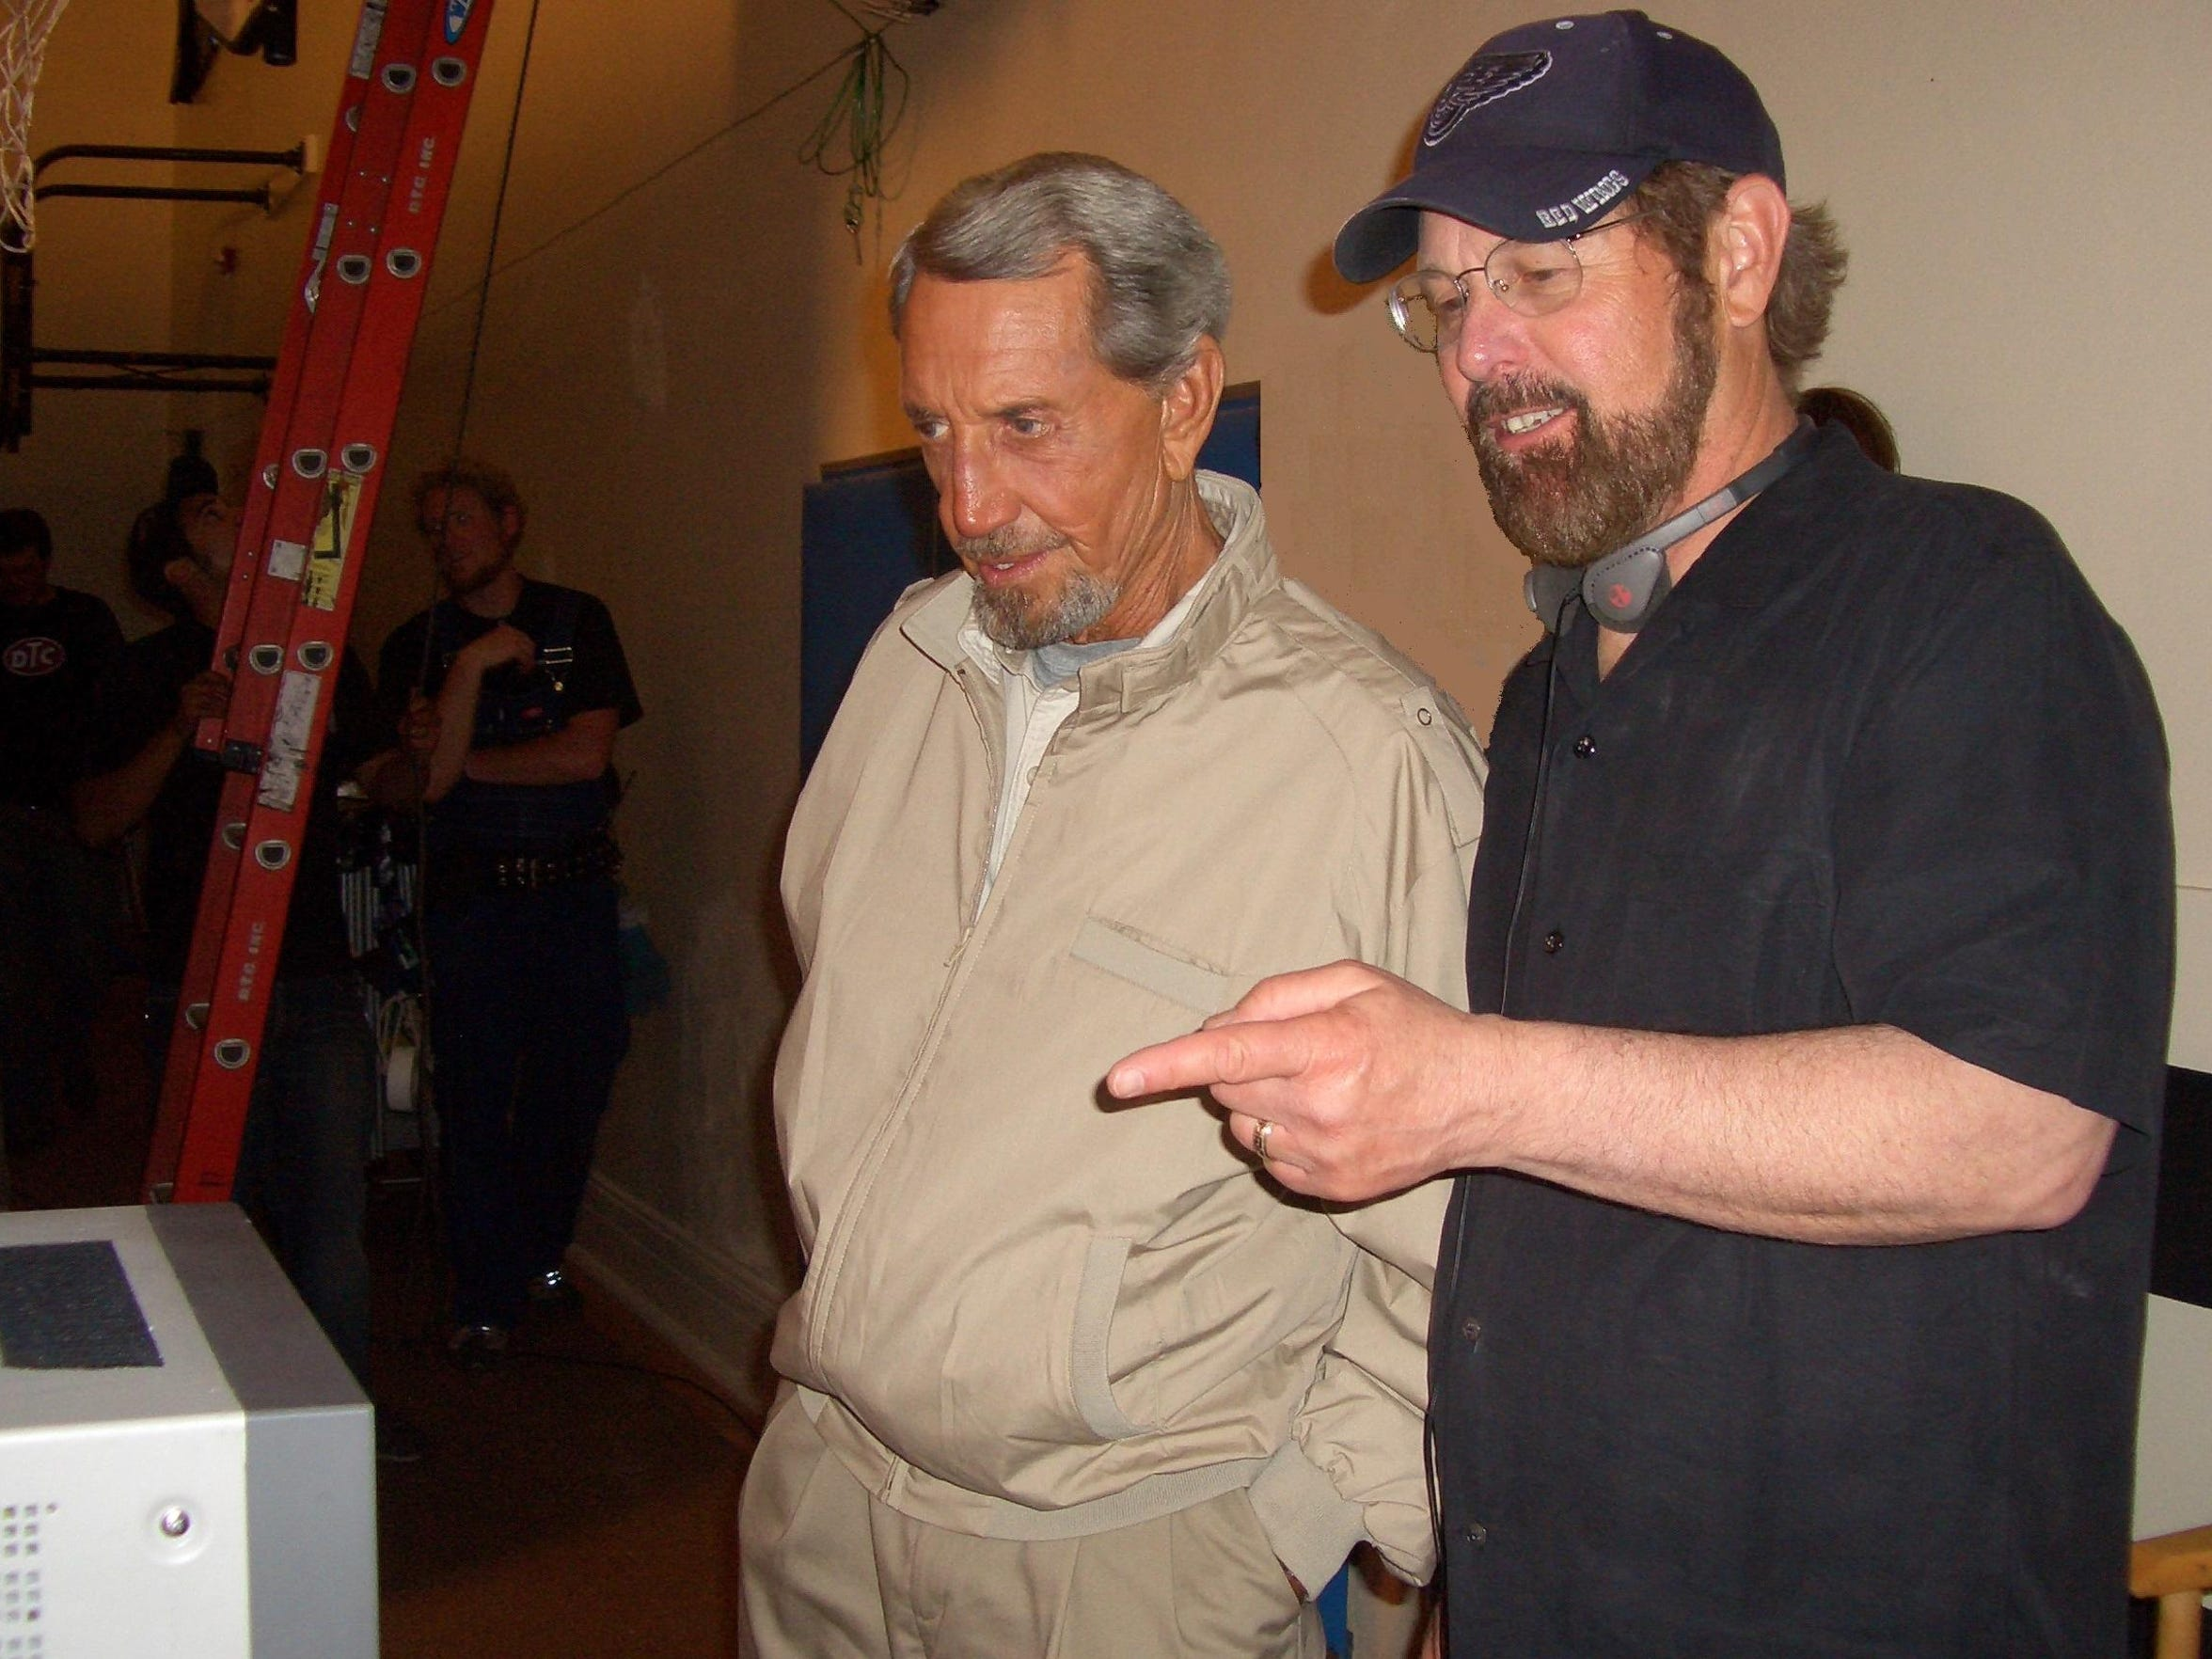 Photo 12 - Roy Scheider and David check playback